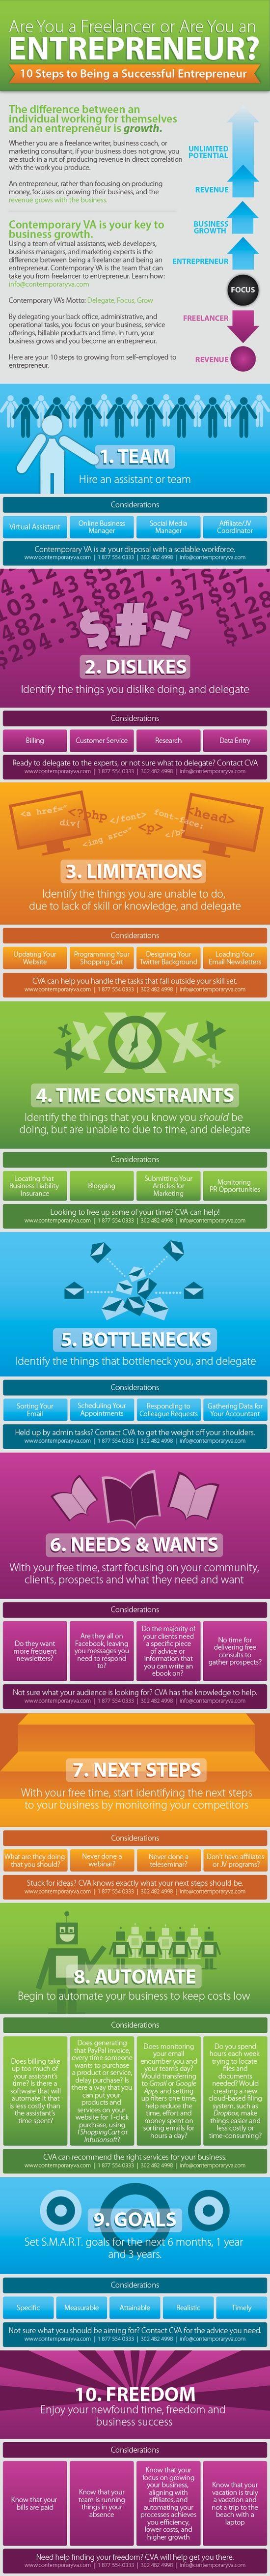 Are you a freelancer or are you an entrepreneur? 10 Steps #infografia #infographic